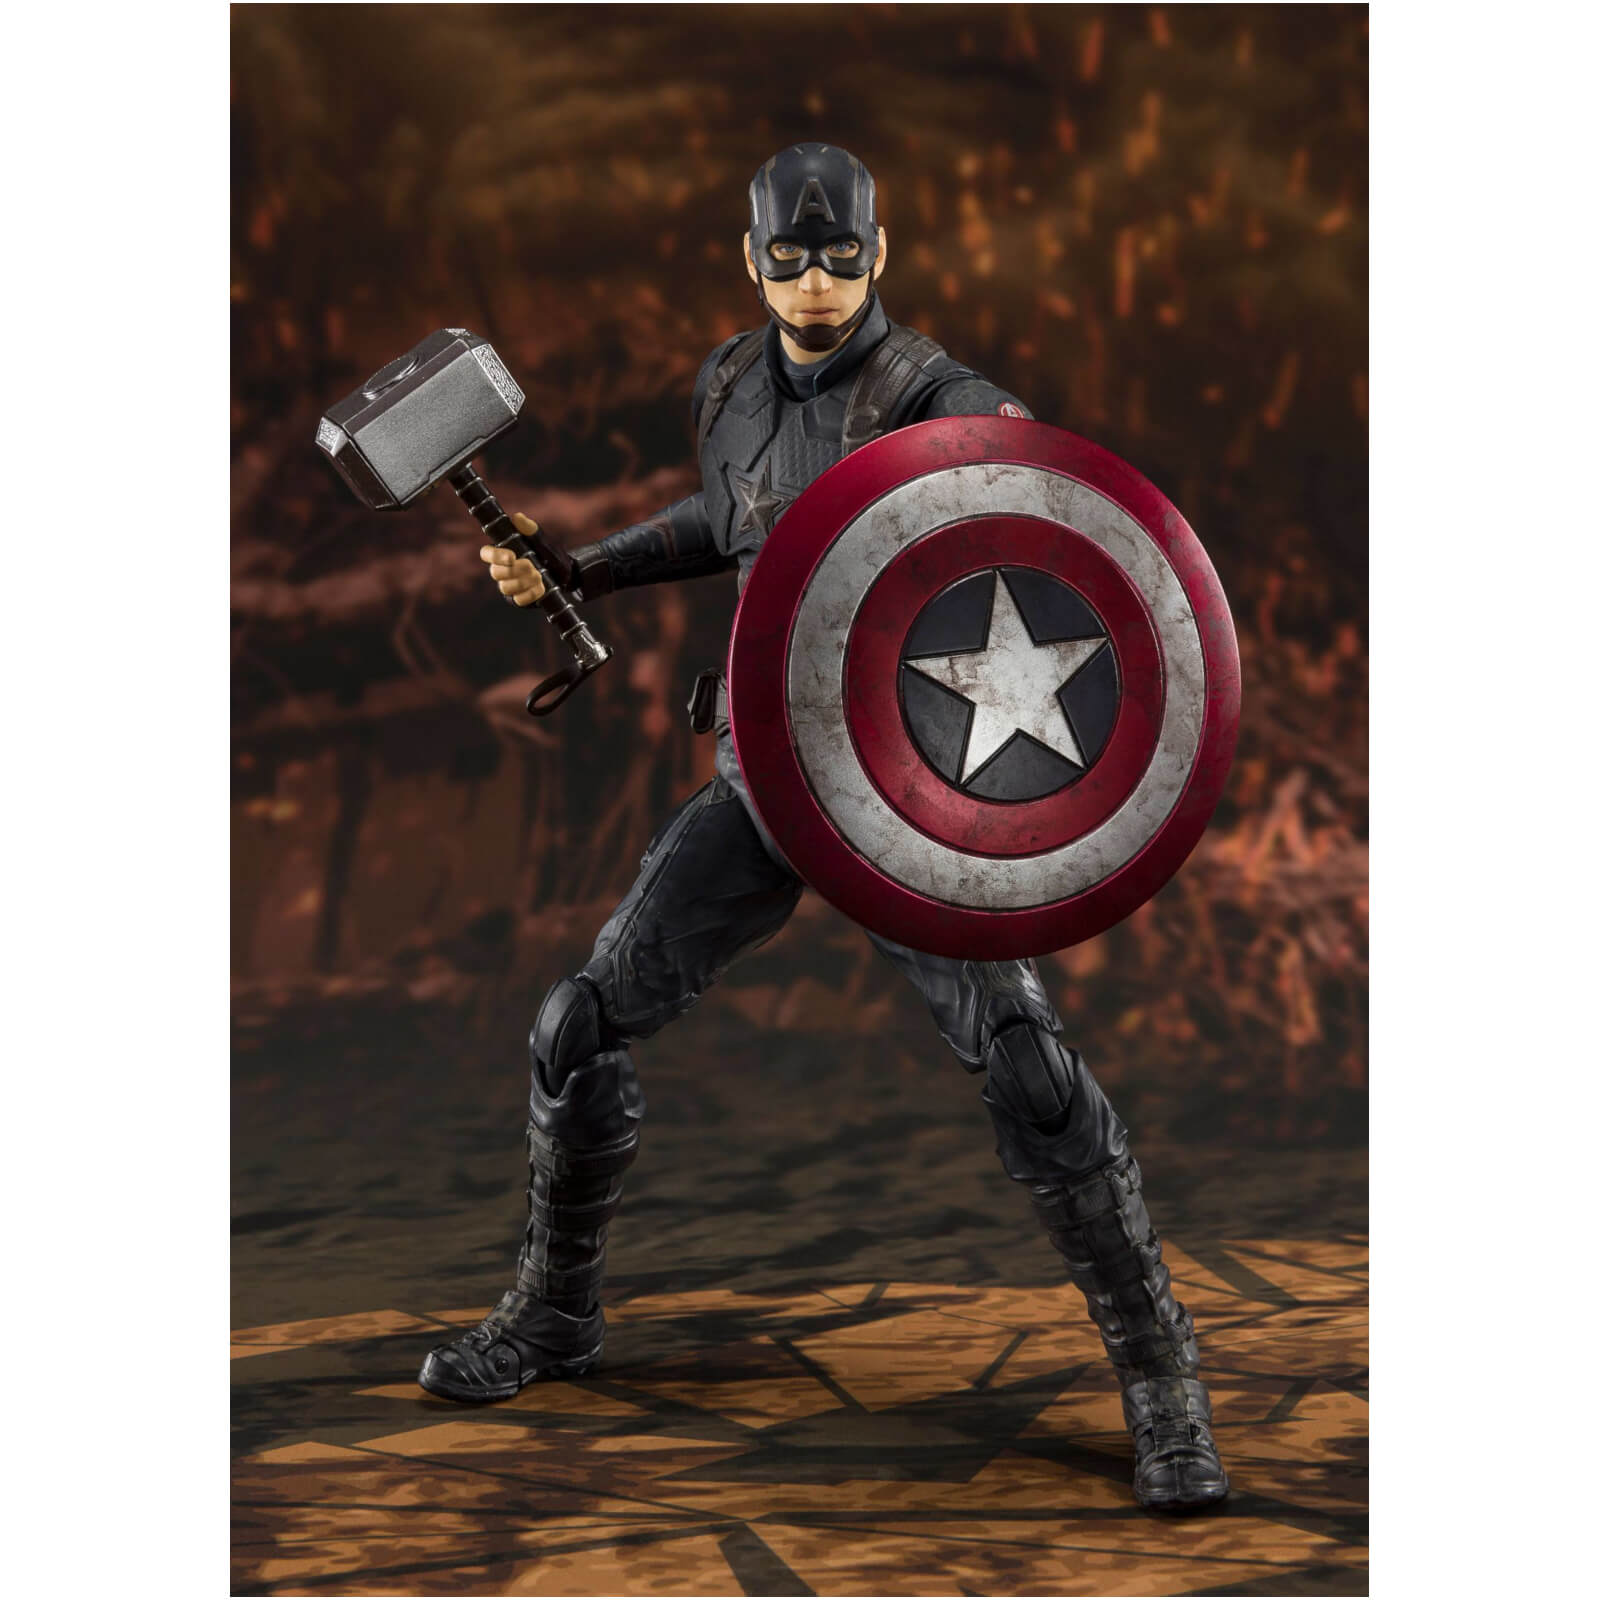 Image of Bandai Tamashii Nations Avengers: Endgame S.H. Figuarts Action Figure Captain America (Final Battle) 15 cm